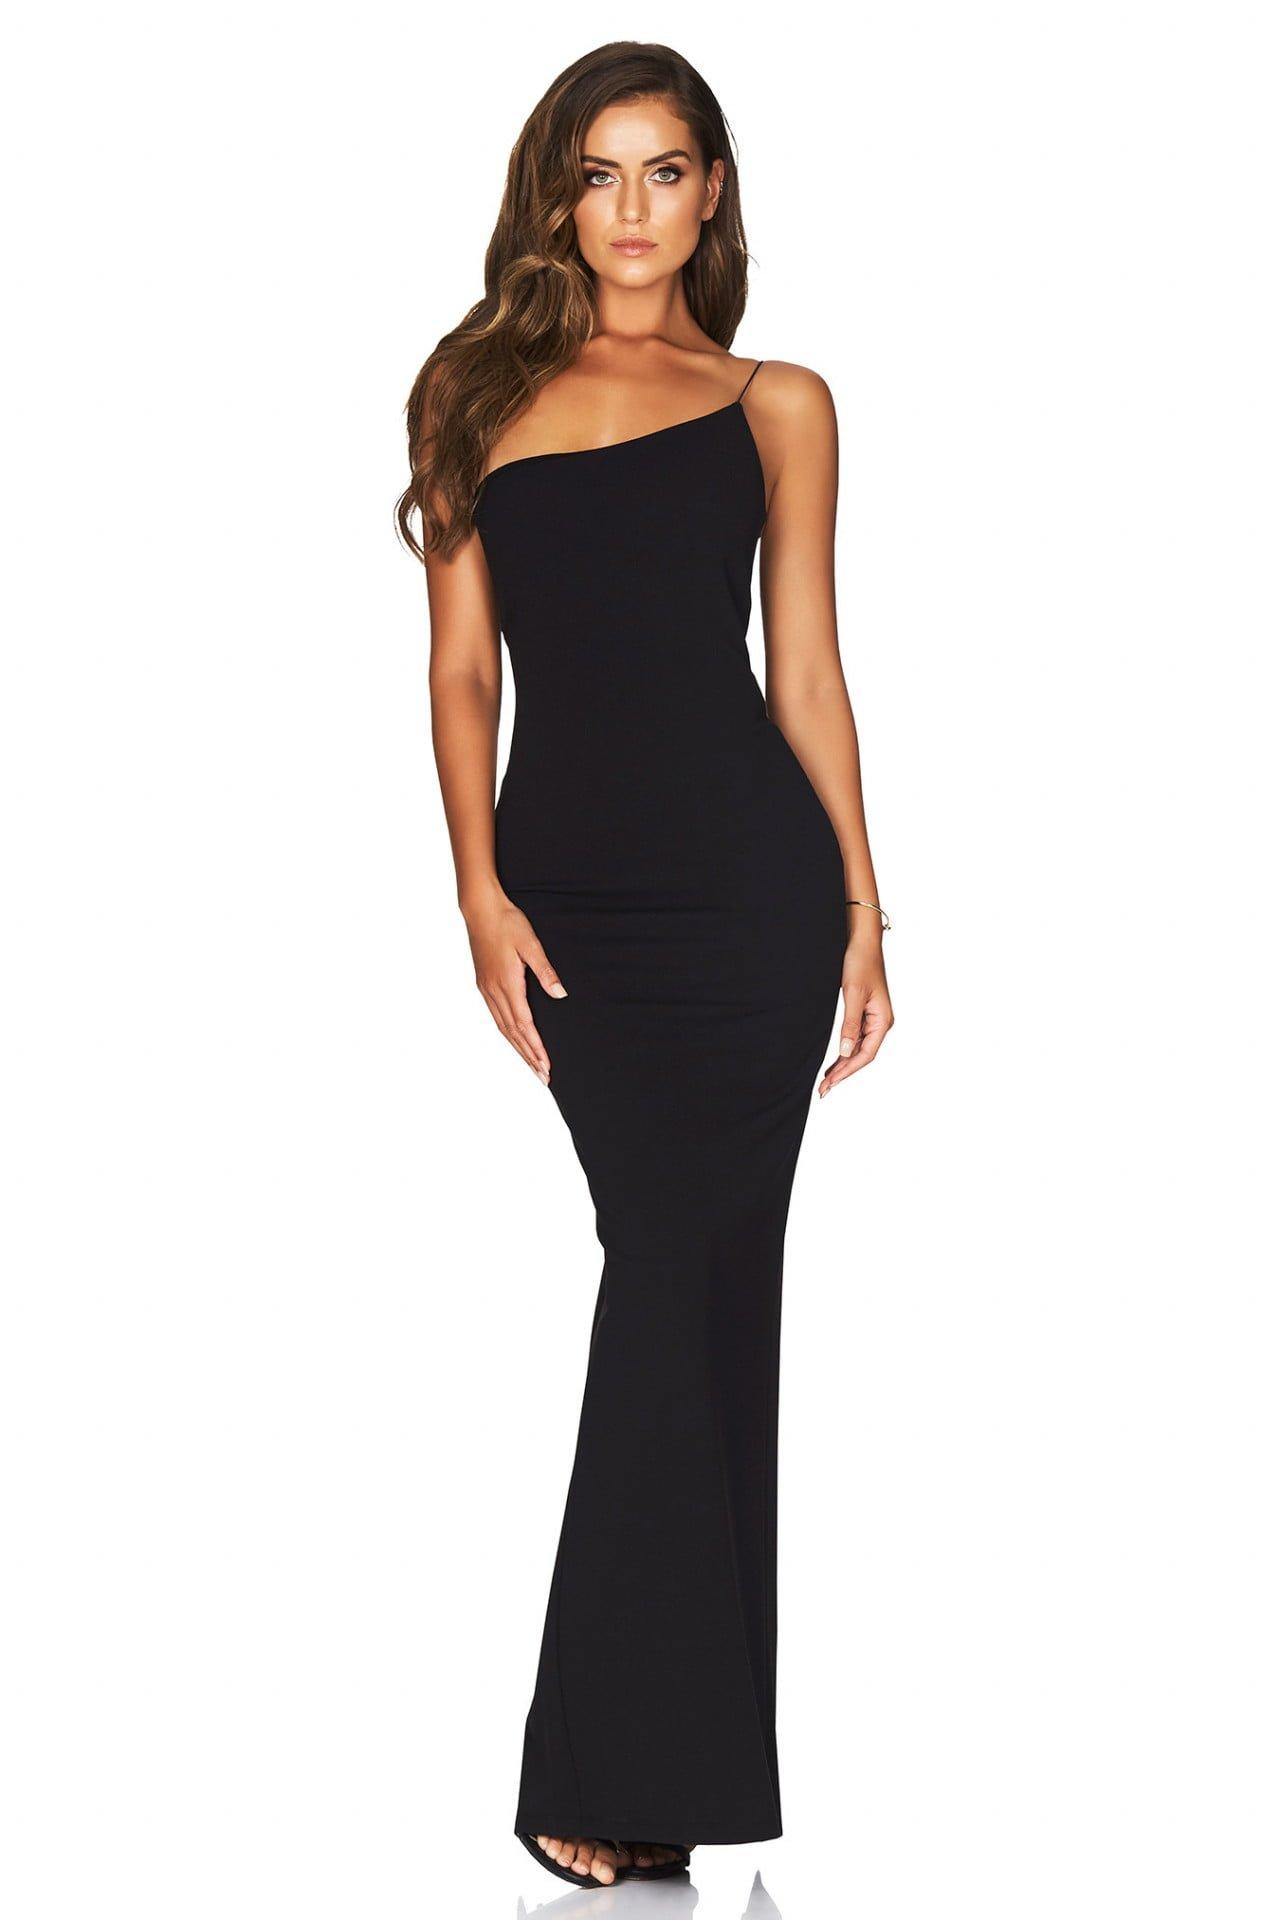 Nookie Penelope Gown Floor Length, Off-Shoulder Black